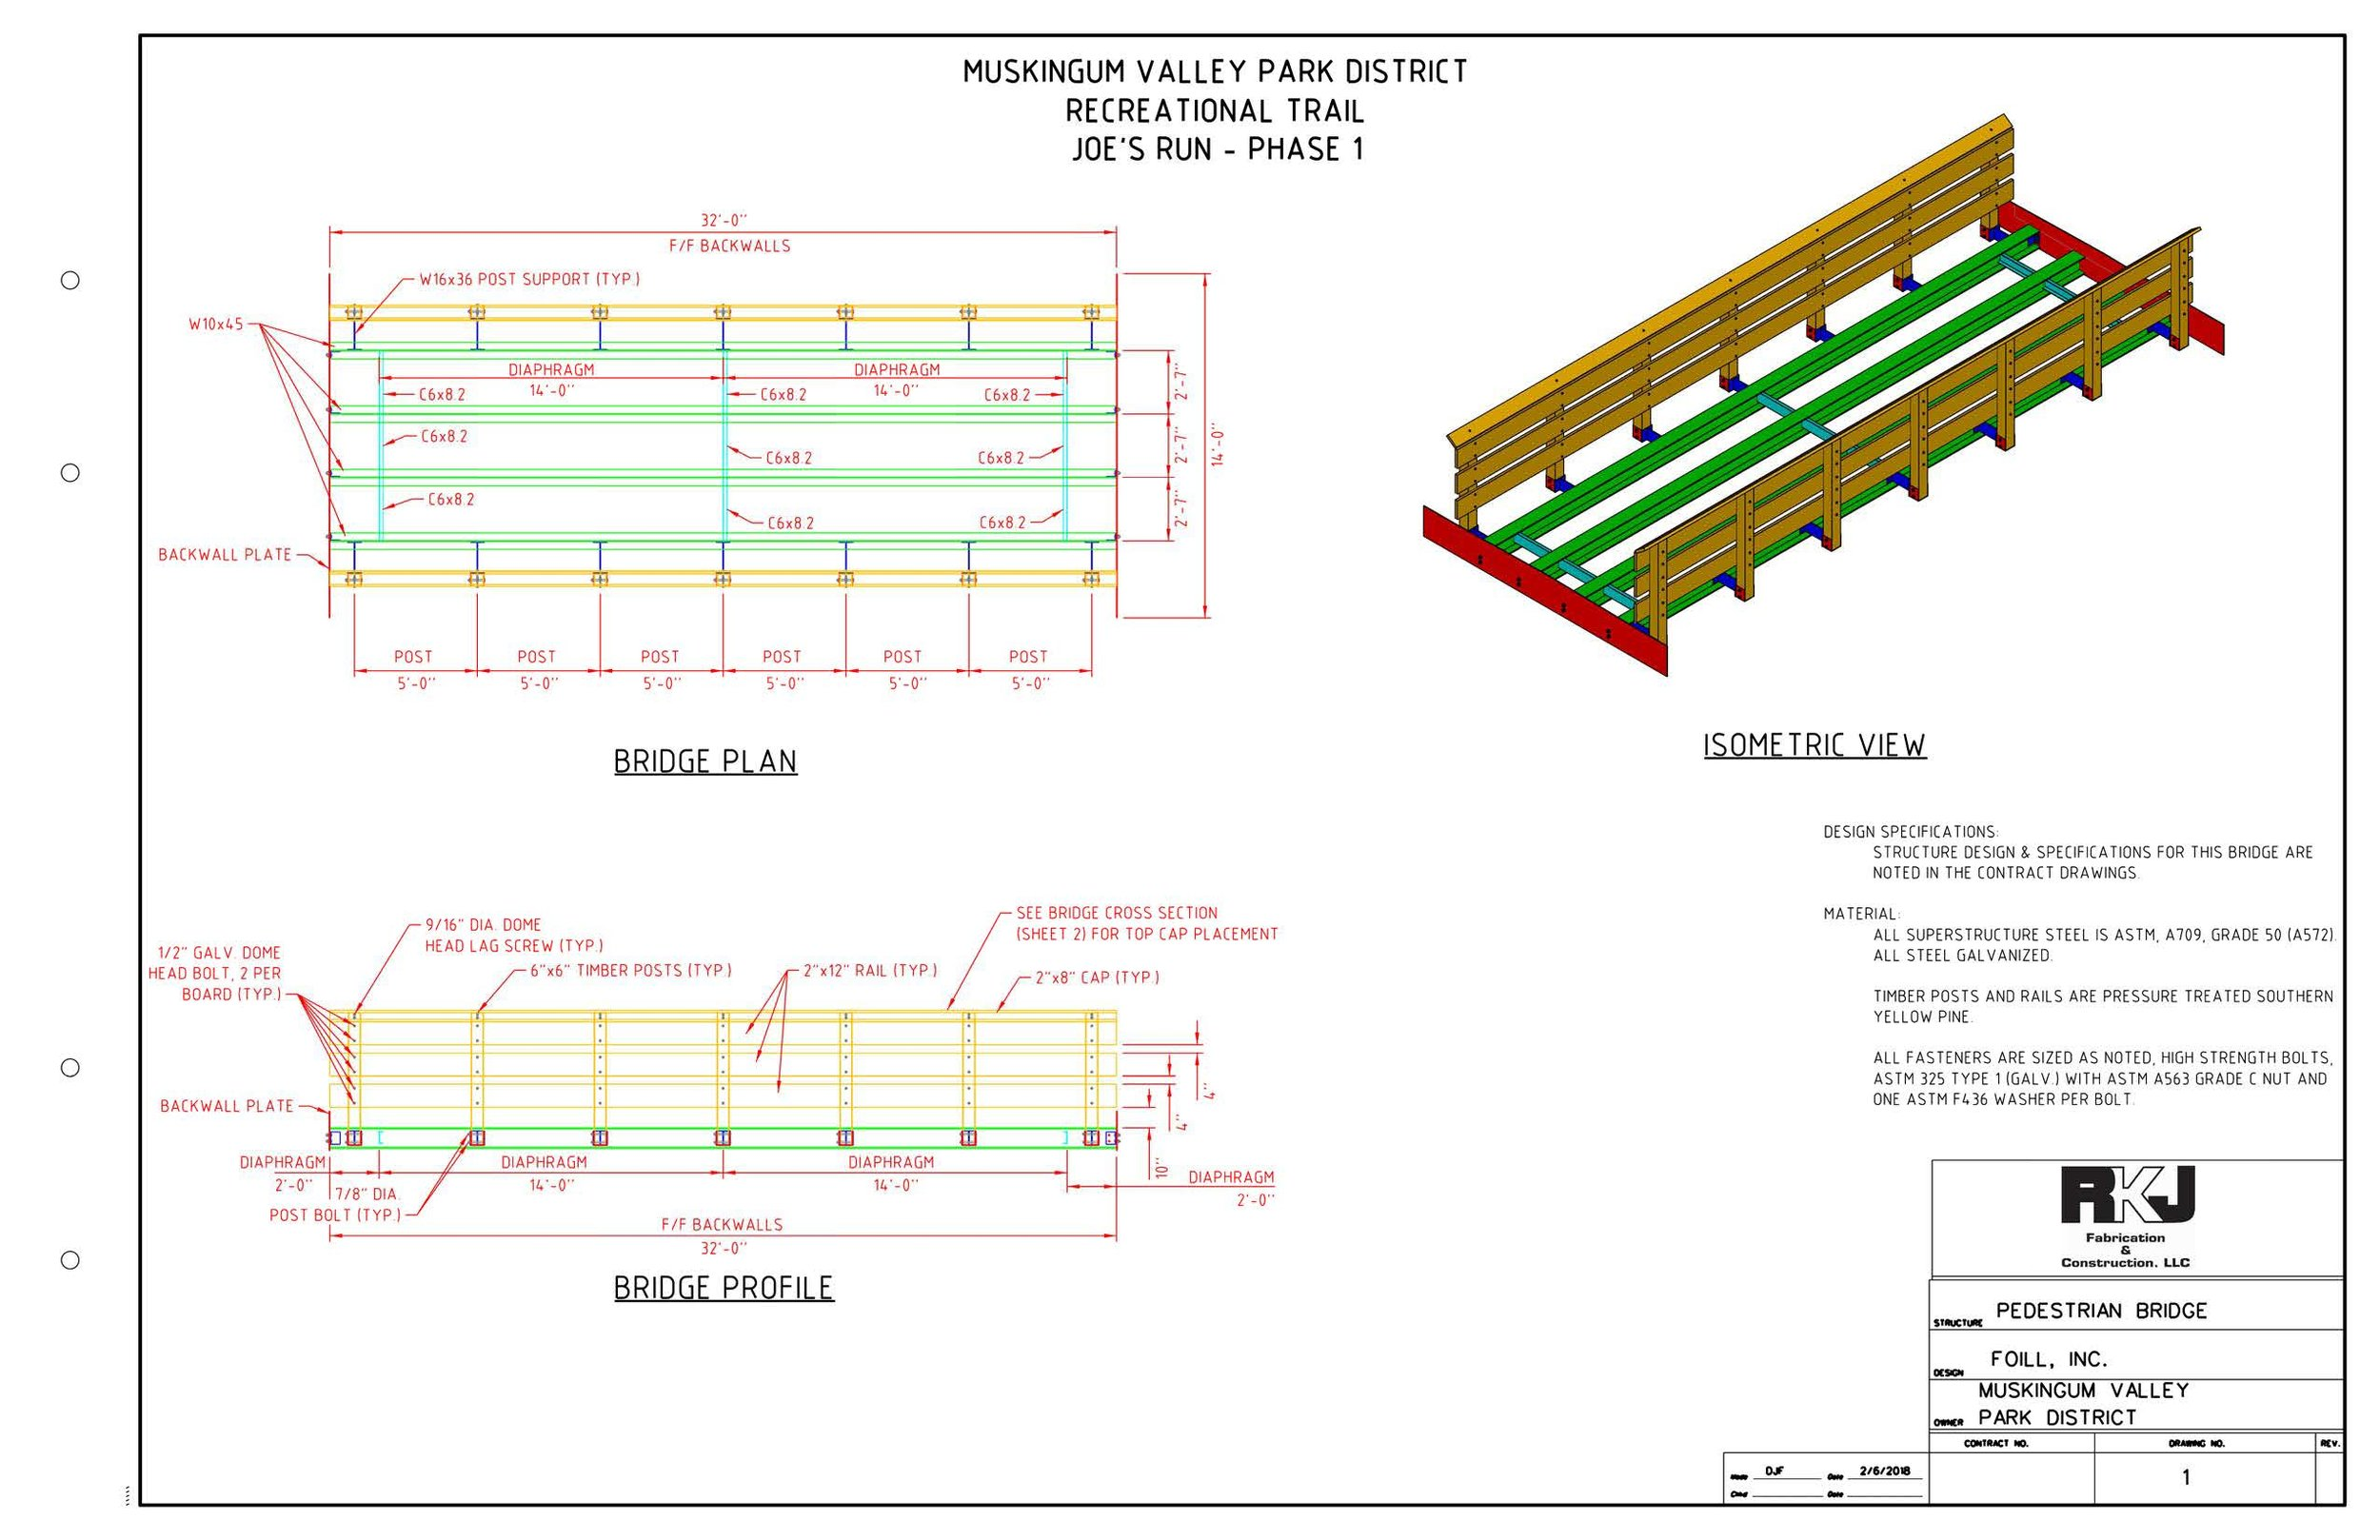 MVPD Recreational Trail, Joes Run Ph. 1,  Pedestrian Bridge Shop Drawings Rev 2_Page_1.jpg